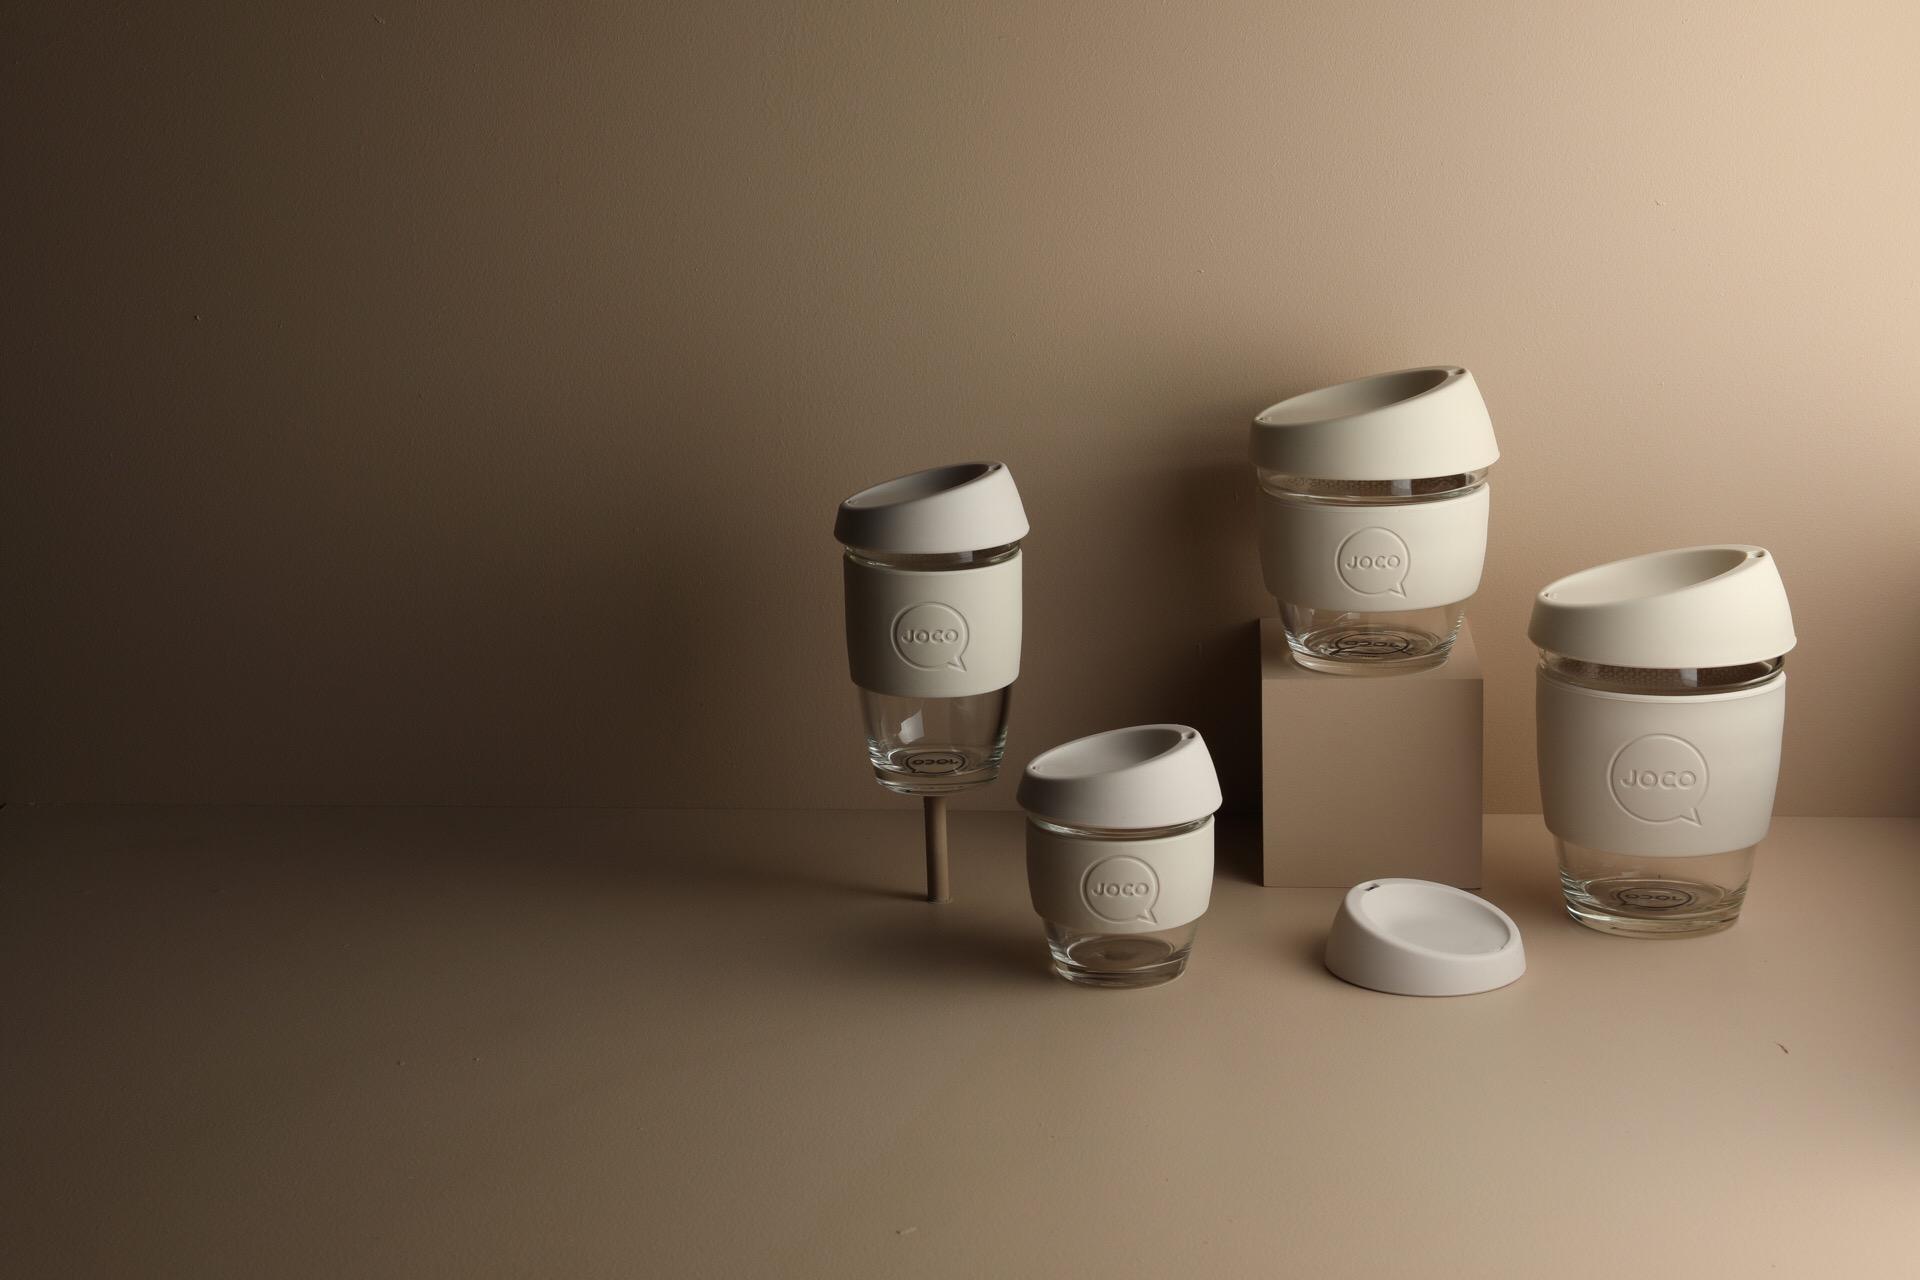 Range of Australian Made JOCO Coffee Cups